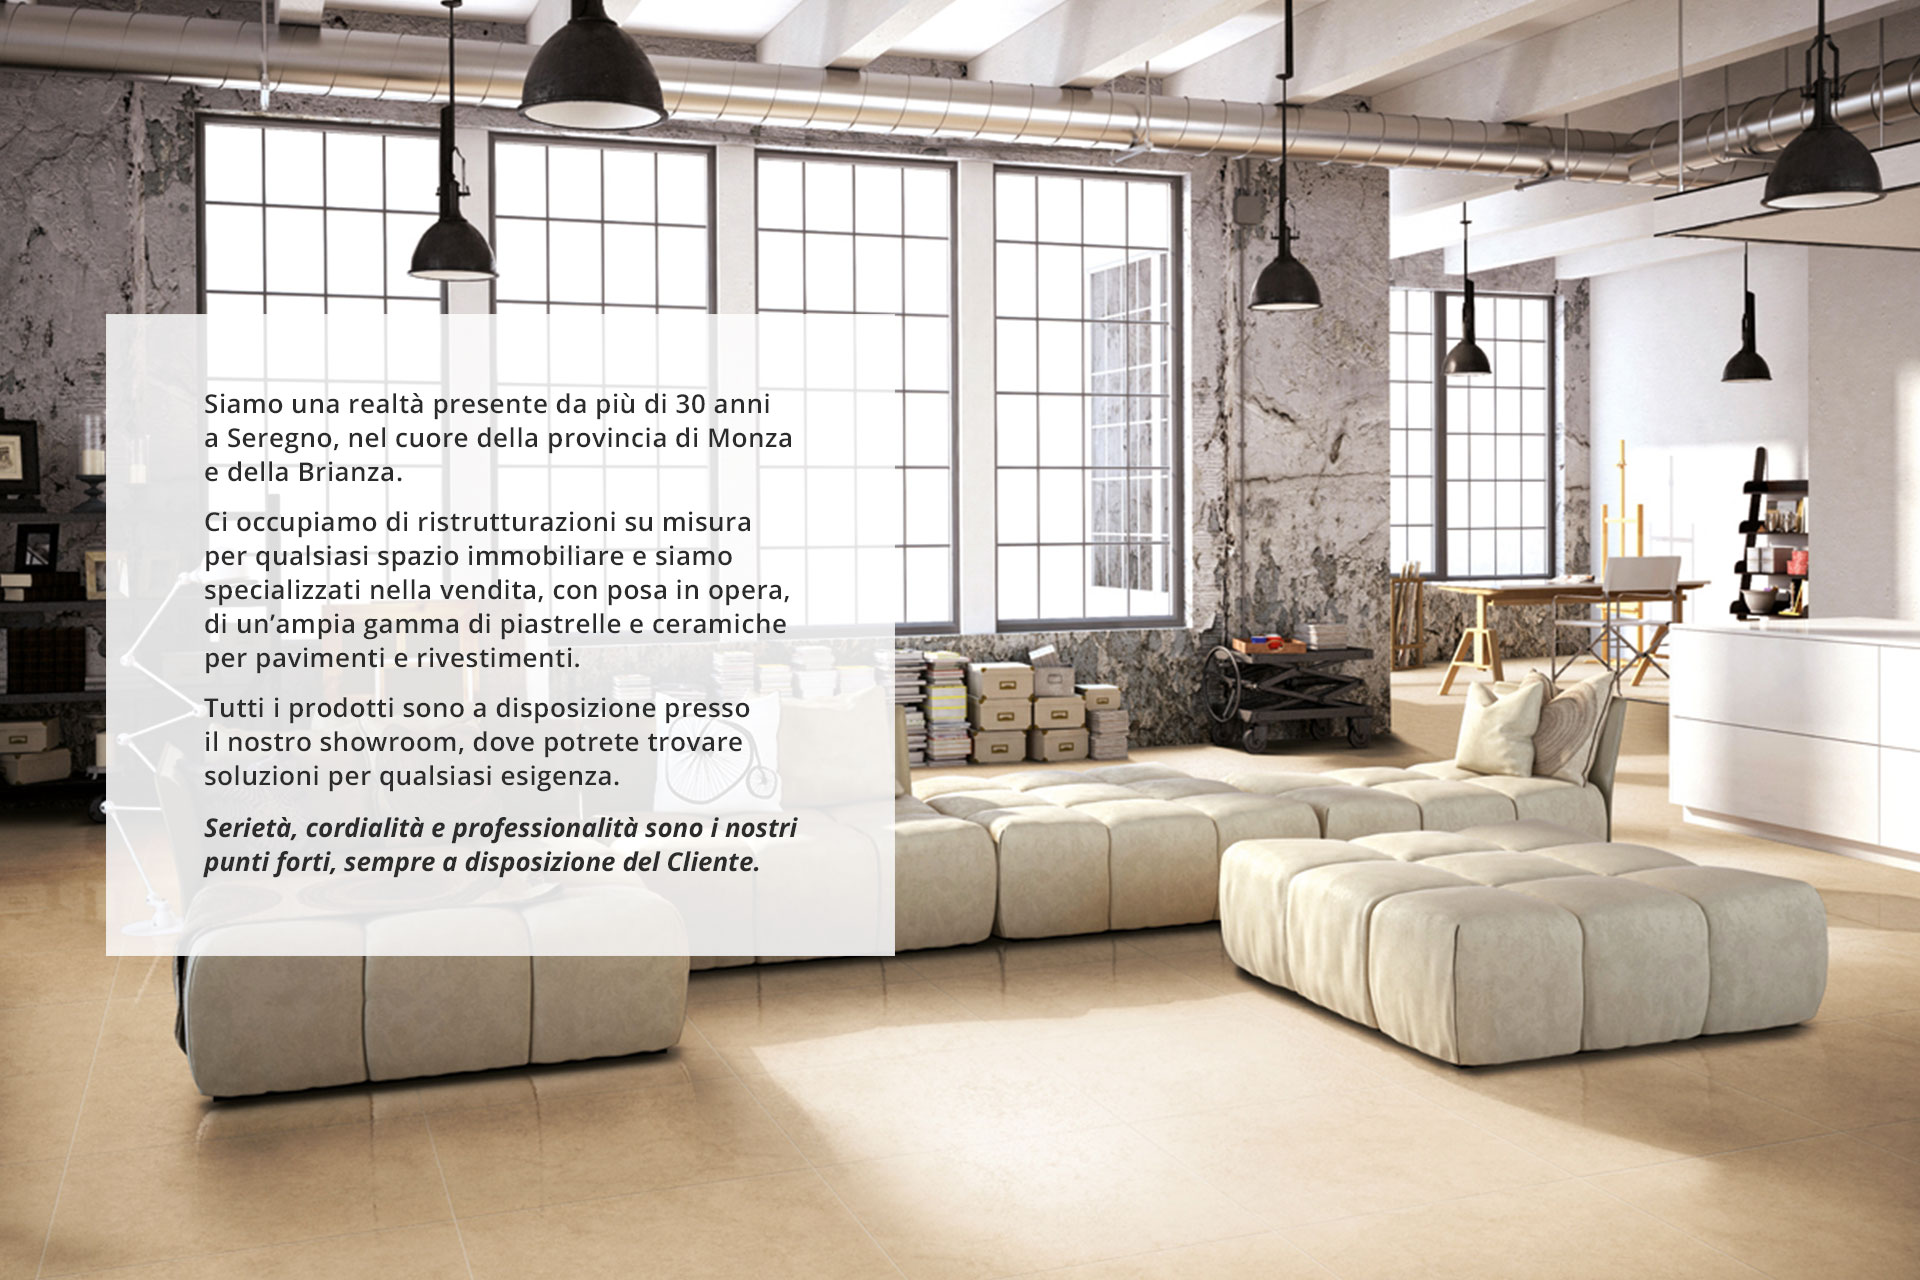 Outlet mobili bagno milano dammi design outlet online di mobili arredamento di review ebooks - Outlet mobili milano ...